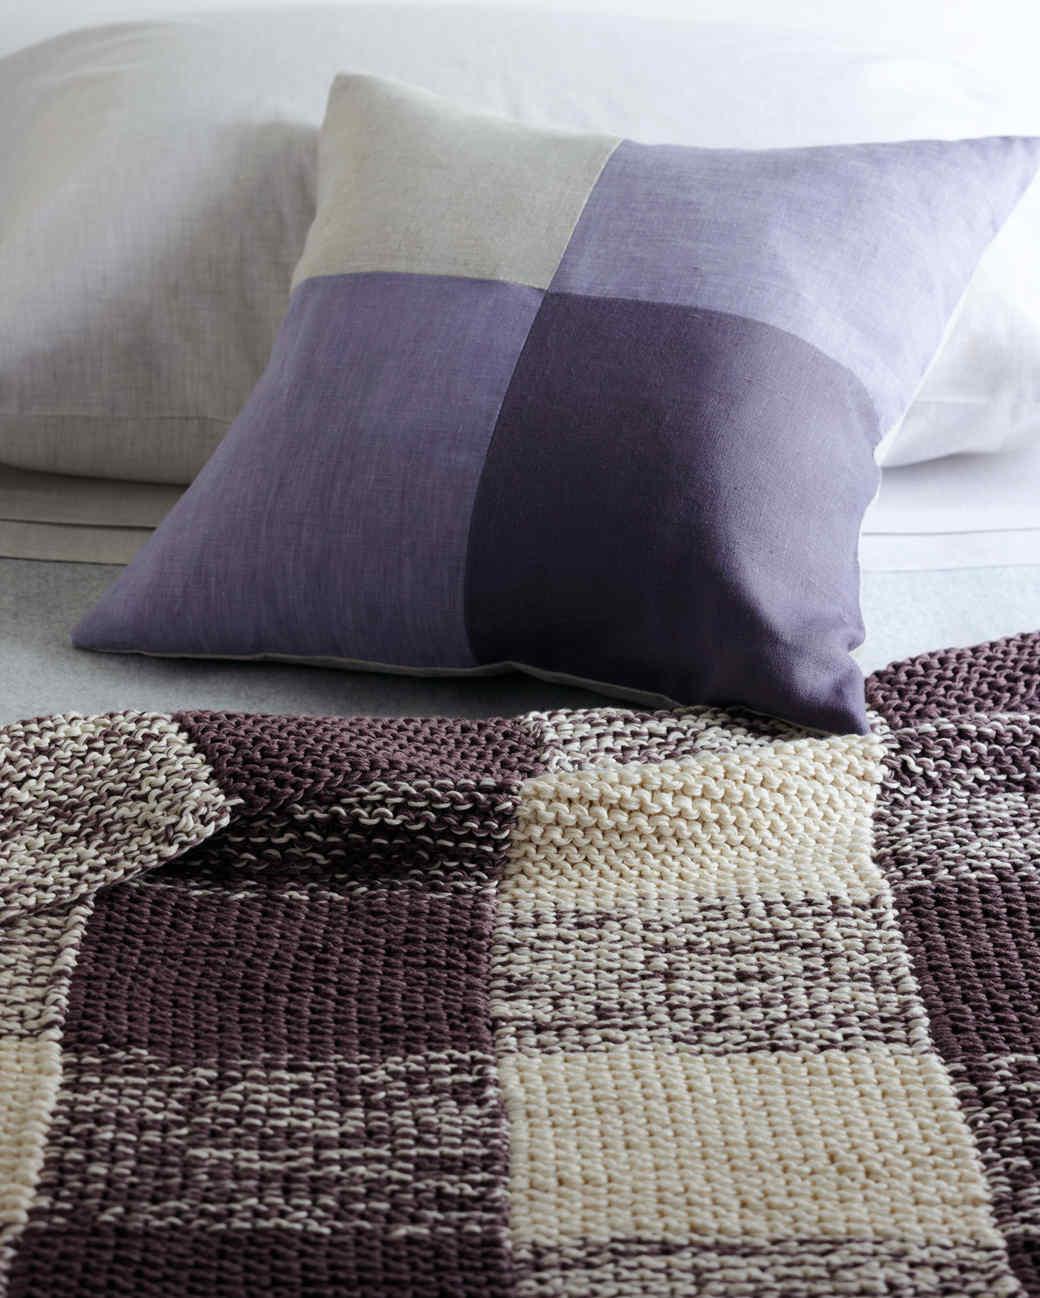 gingham knit blanket